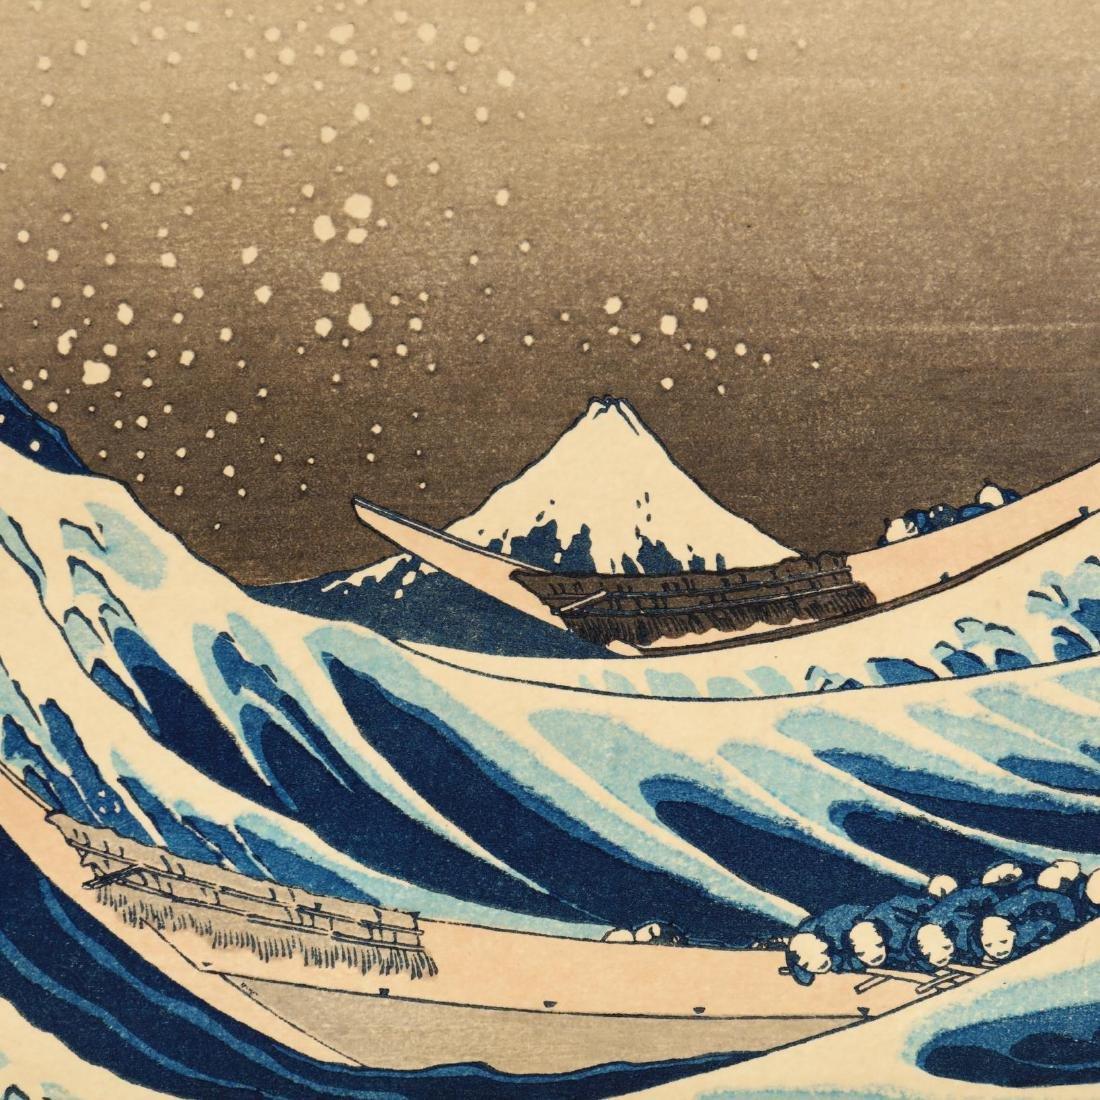 Kanagawa  by Katsushika Hokusai (Japanese, 1760-1849) - 3